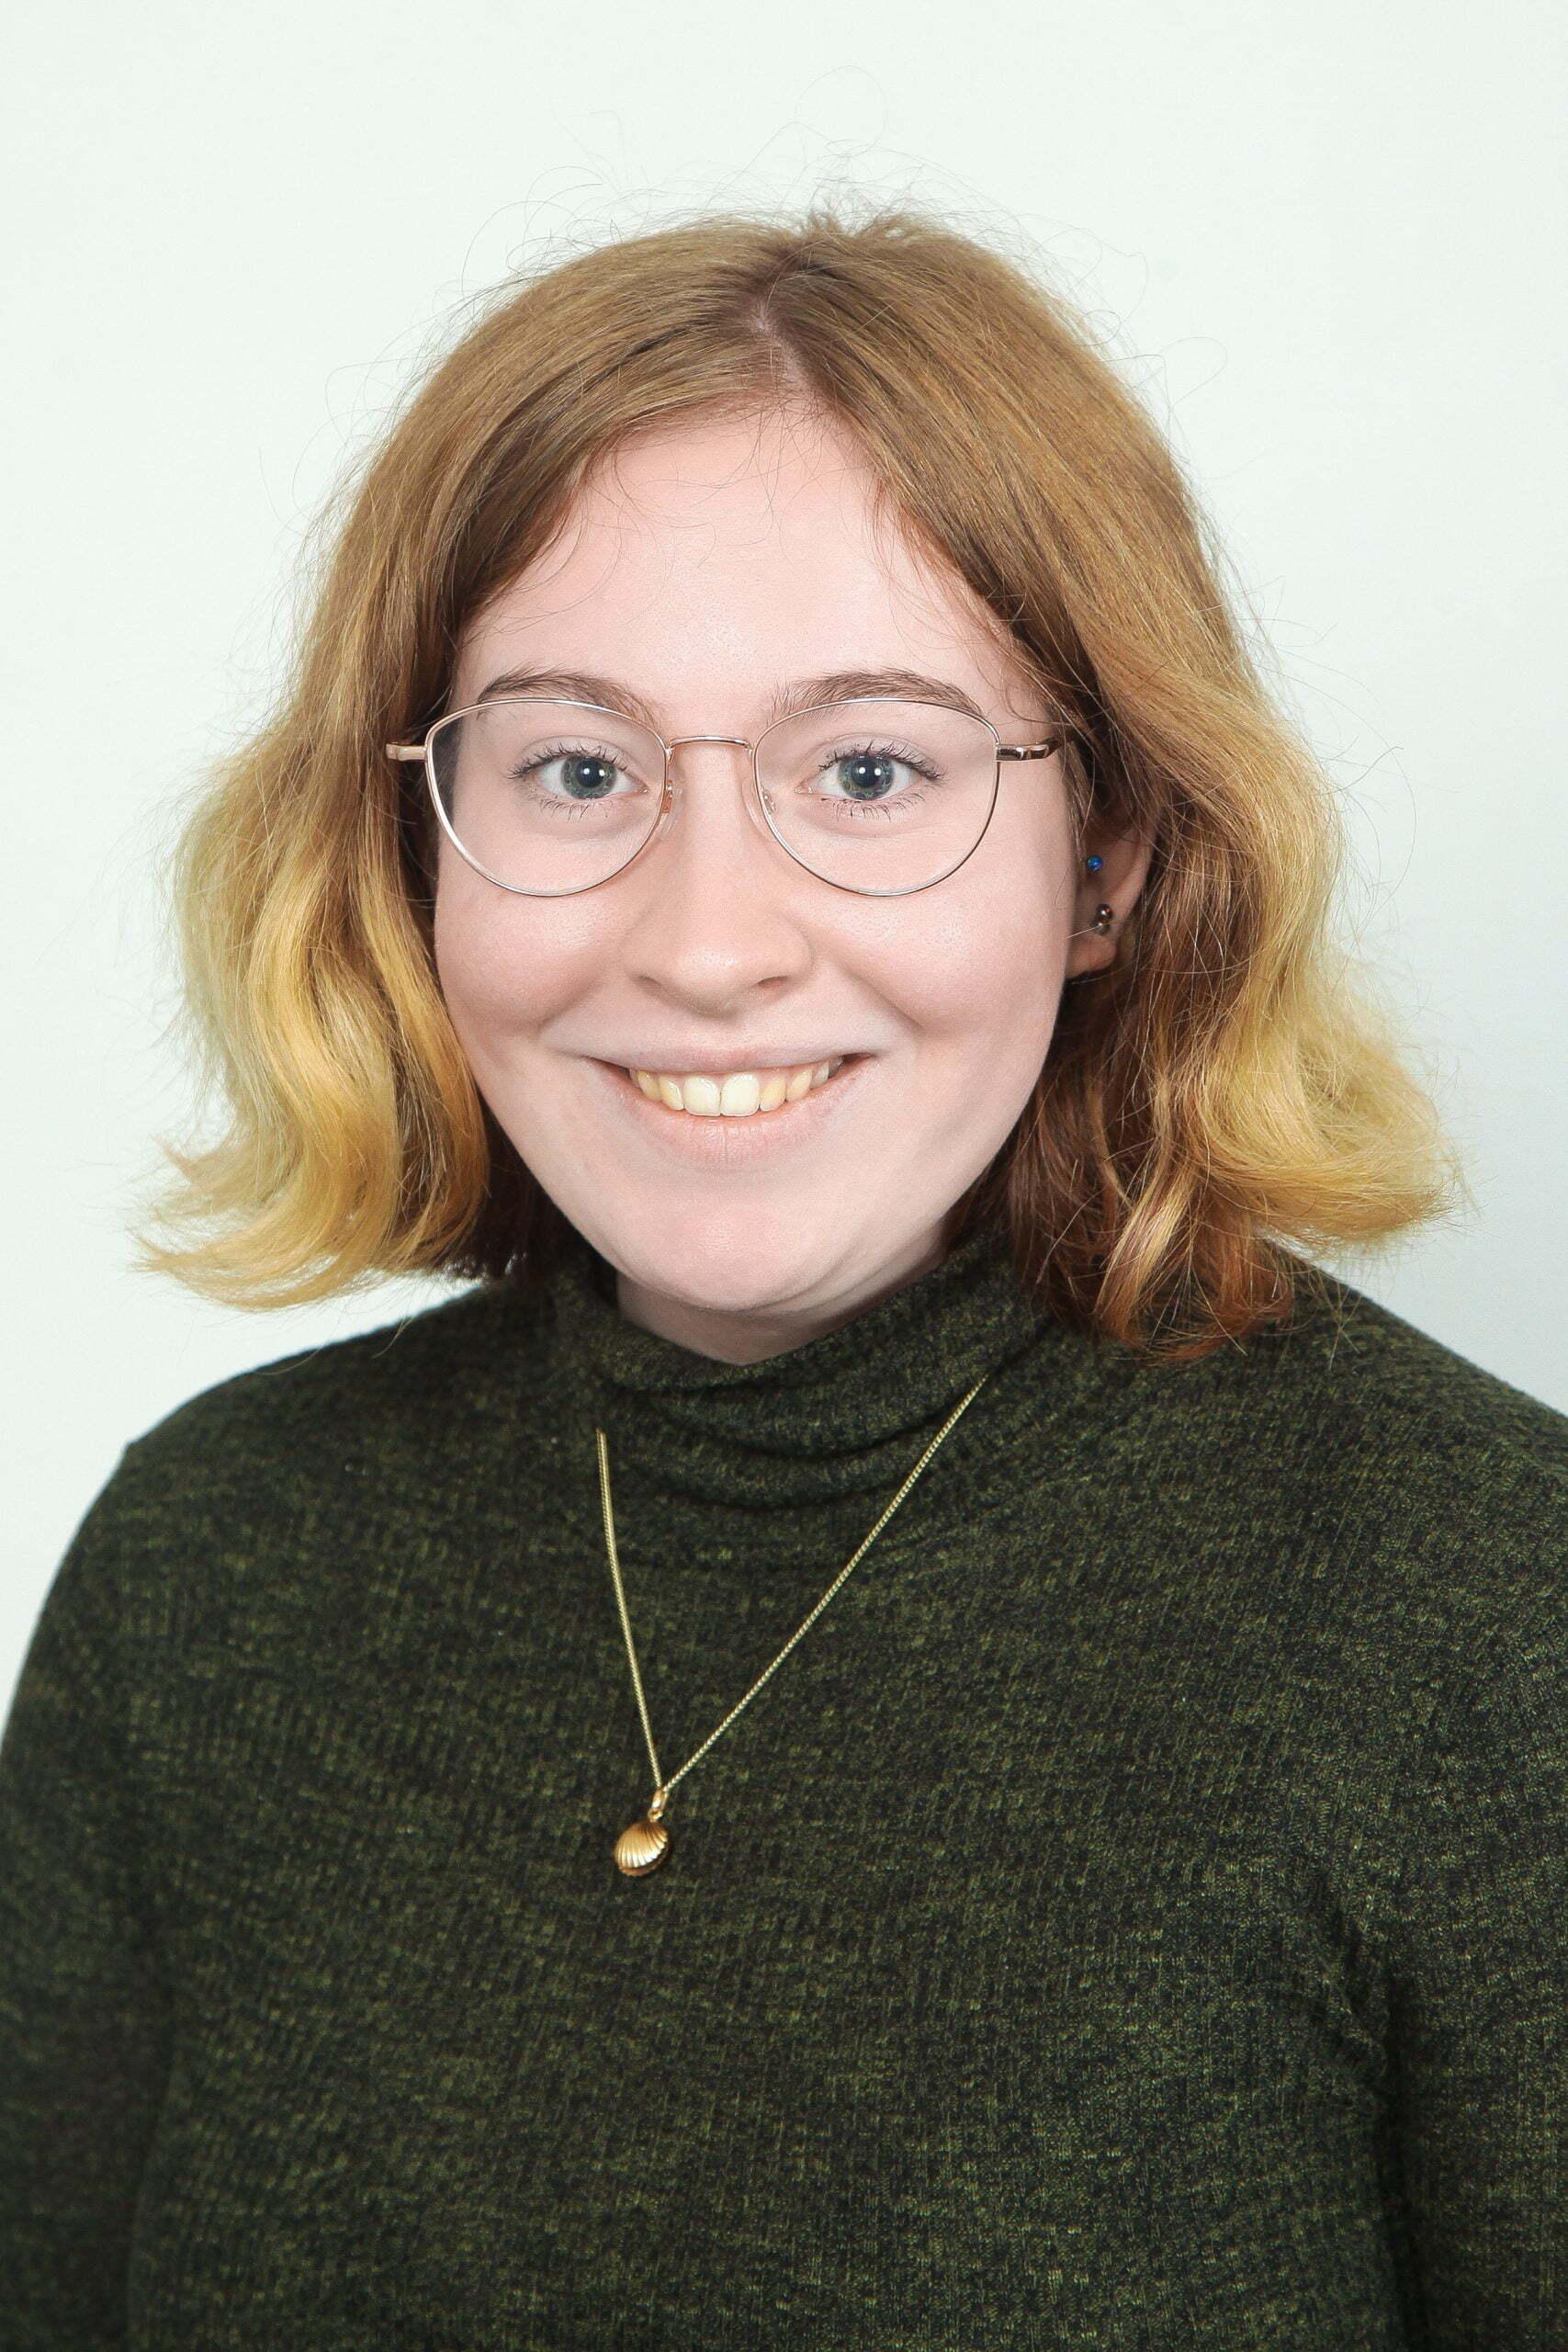 Malena Schipp